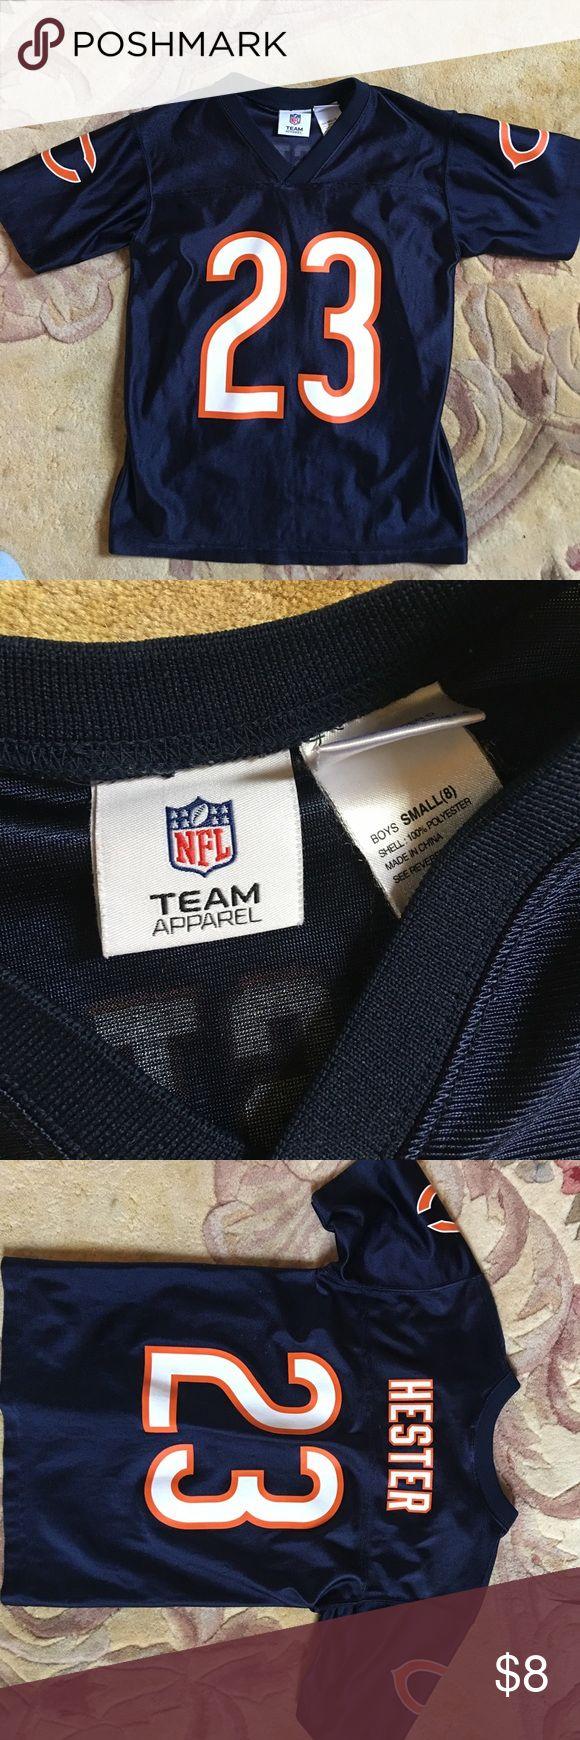 Boys Chicago bears jersey Boys sz8 Chicago Bears Hester jersey NFL Shirts & Tops Tees - Short Sleeve